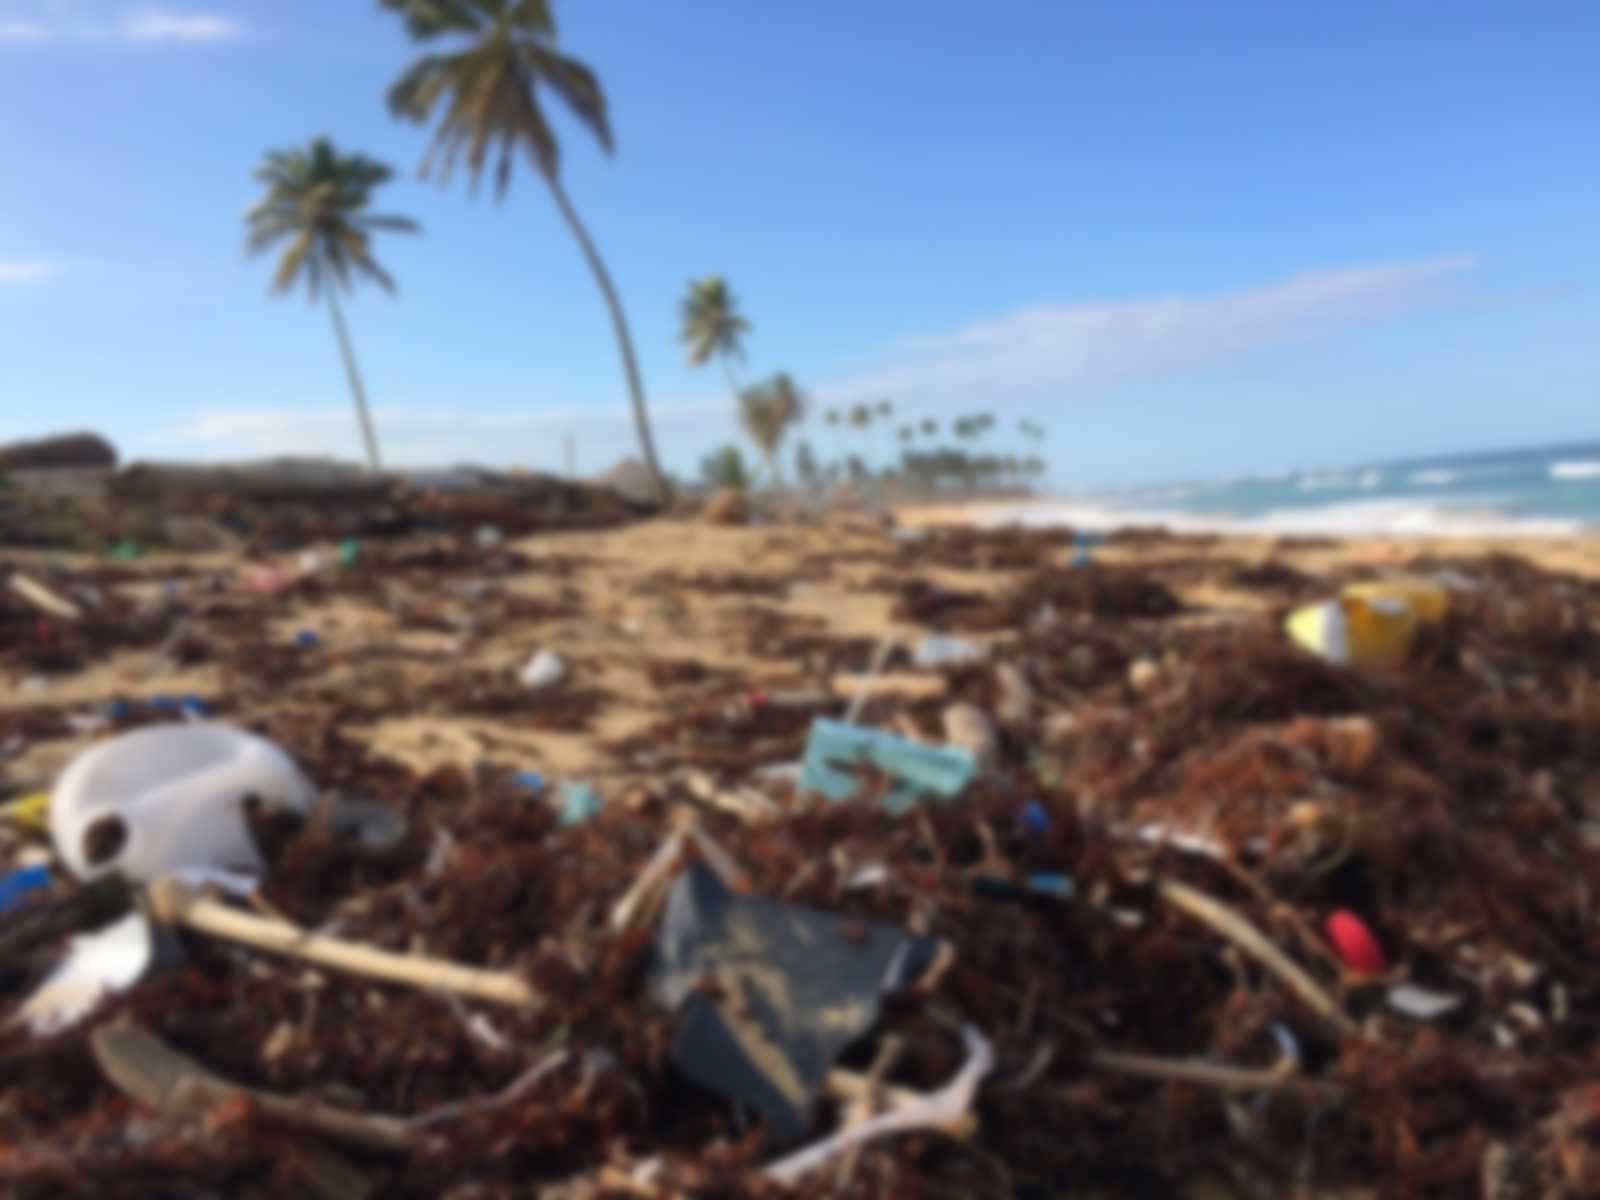 Can hemp replace plastics